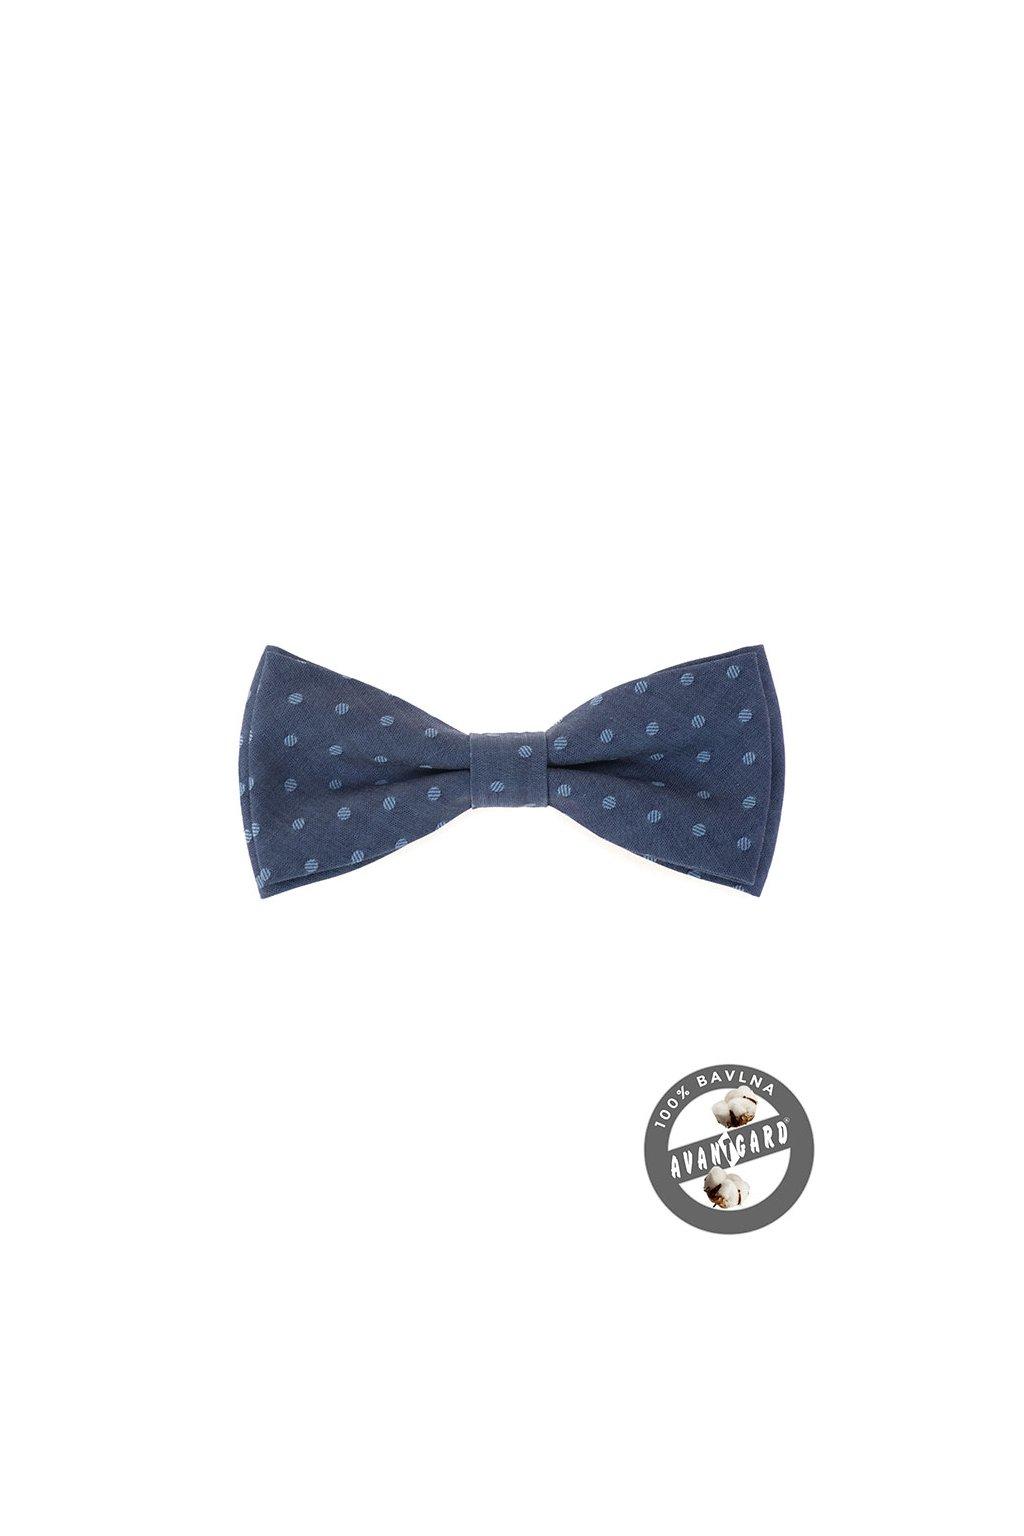 Motýlek PREMIUM bavlněný , 600-5151, Modrá